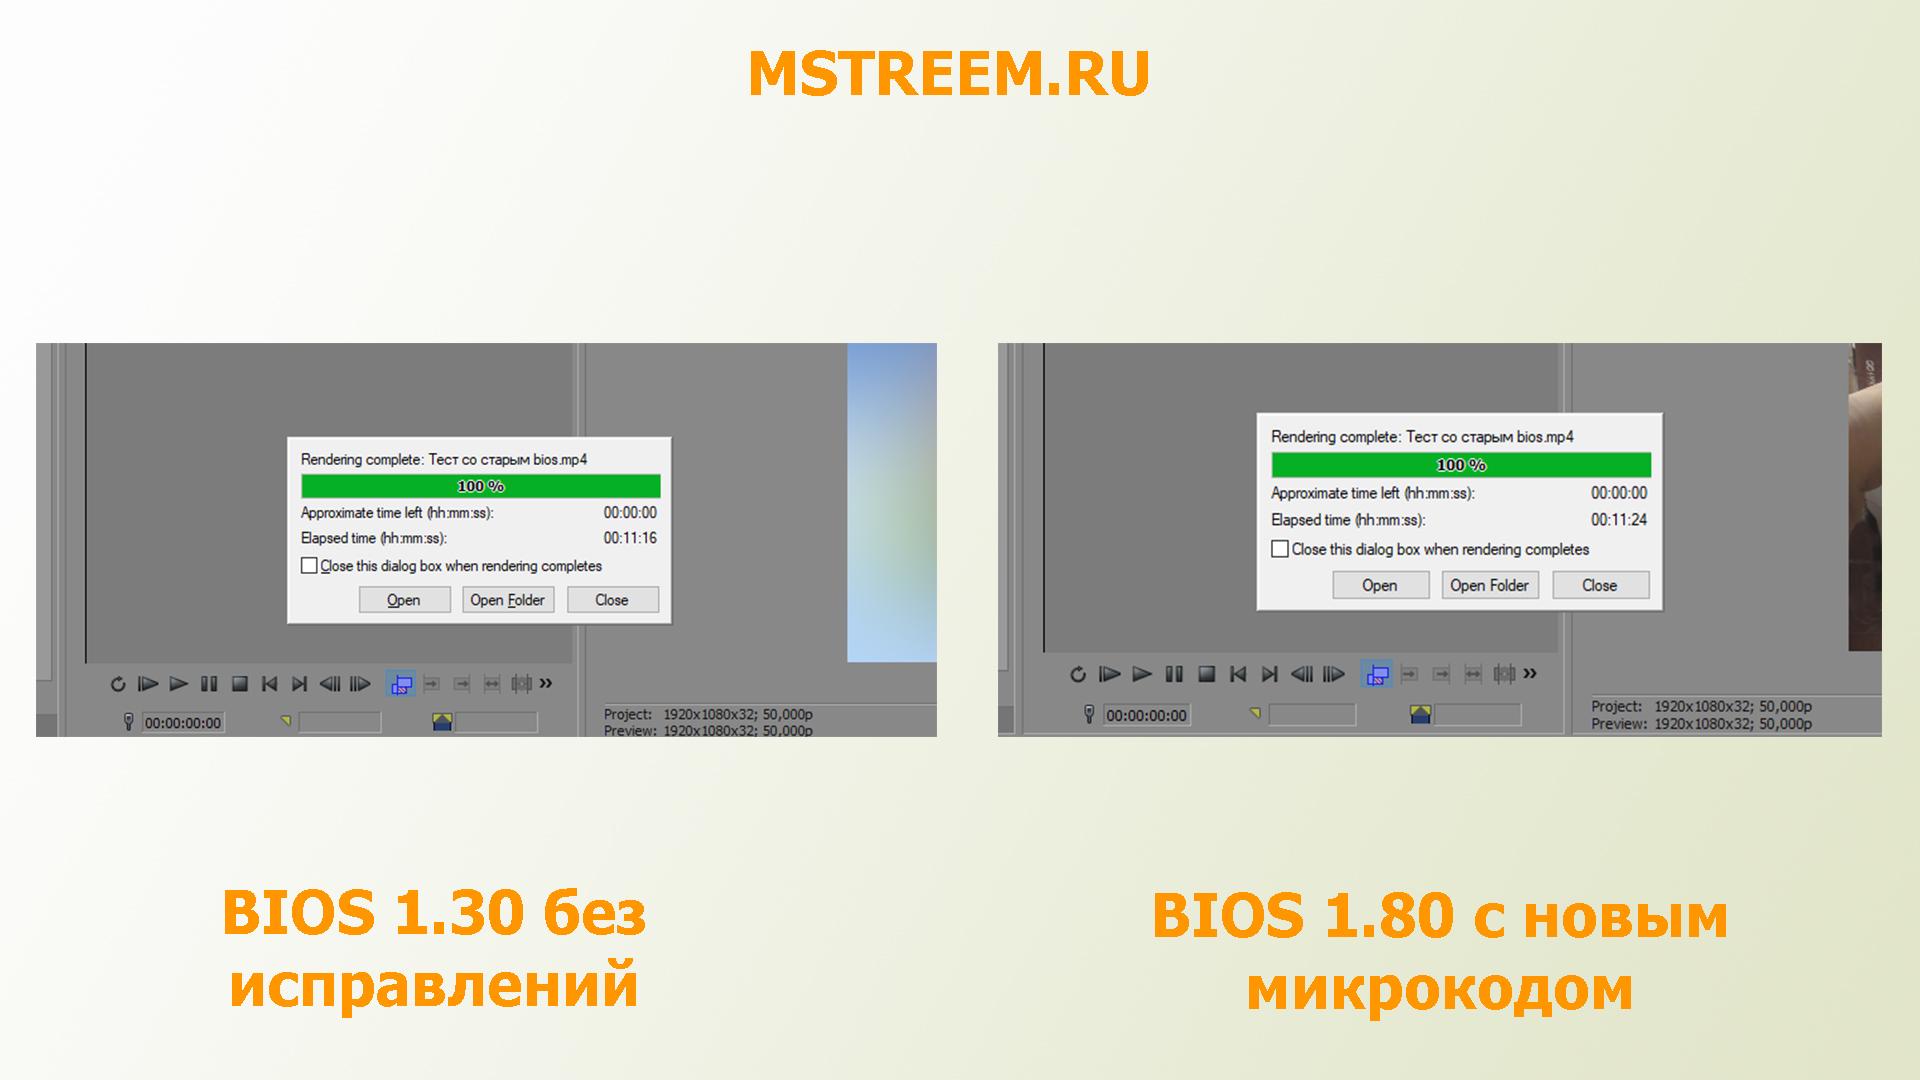 Тест производительности при монтаже видео новый микрокод процессора Intel. Spectre и Meltdown